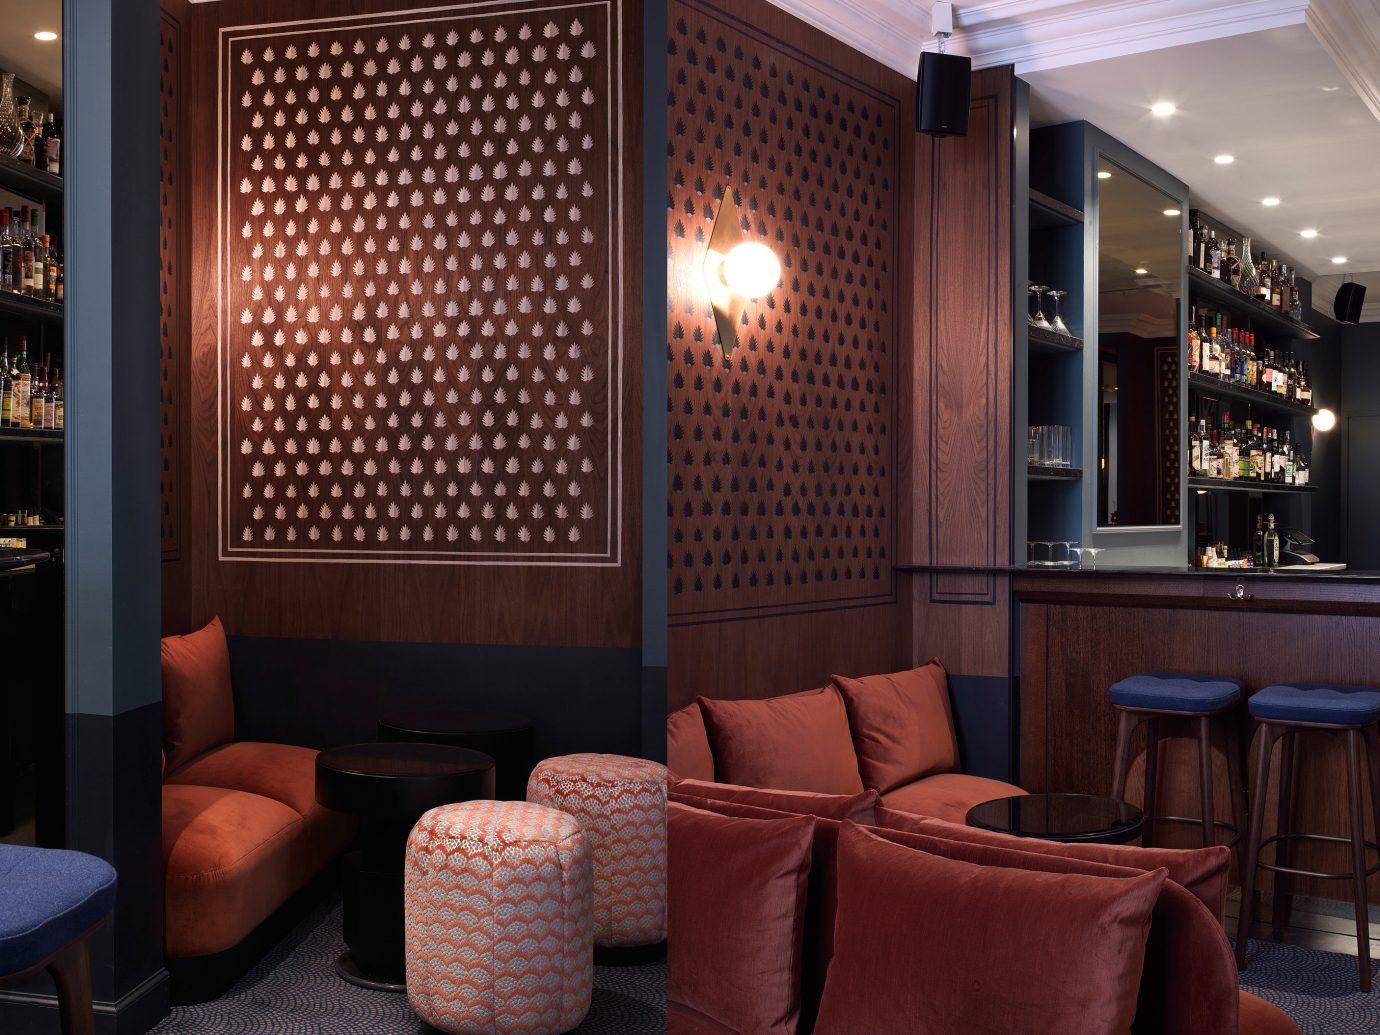 Jetsetter Guides indoor chair room Lobby interior design Bar living room restaurant Design window covering furniture